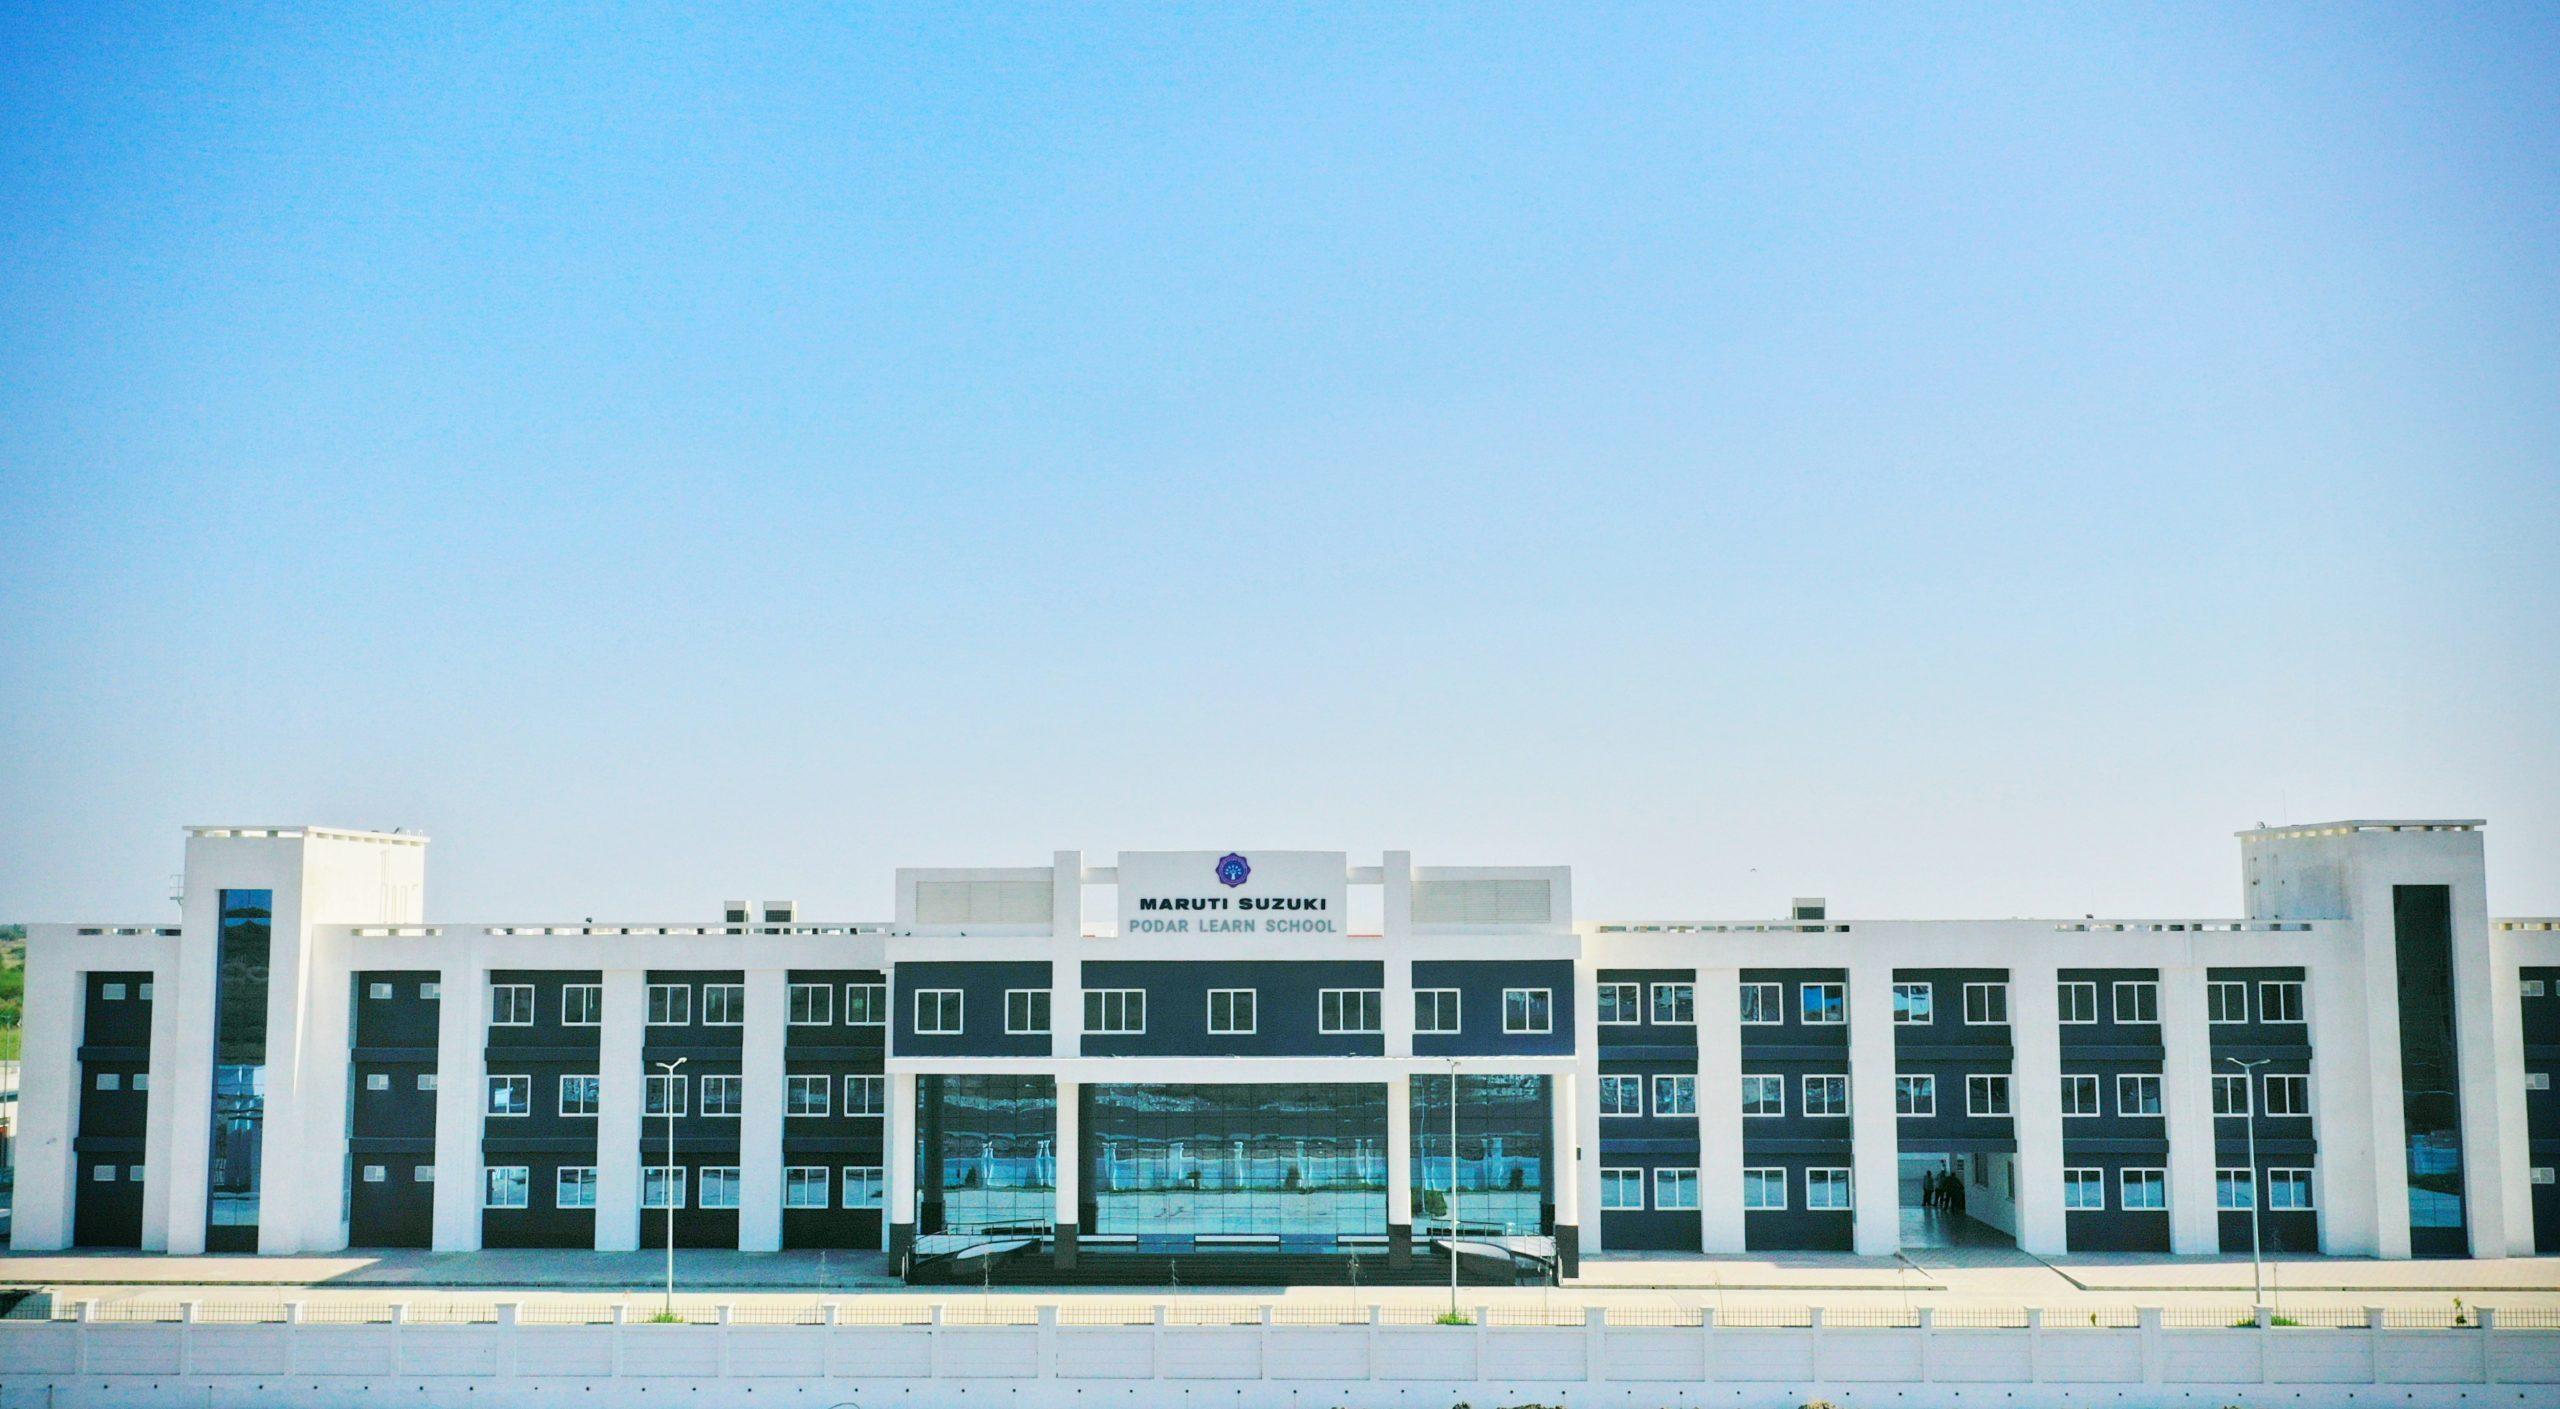 Maruti Suzuki Podar Learn School in Sitapur, Taluka - Mandal, Dist - Ahmedabad, Gujarat set to open virtually in June 2021